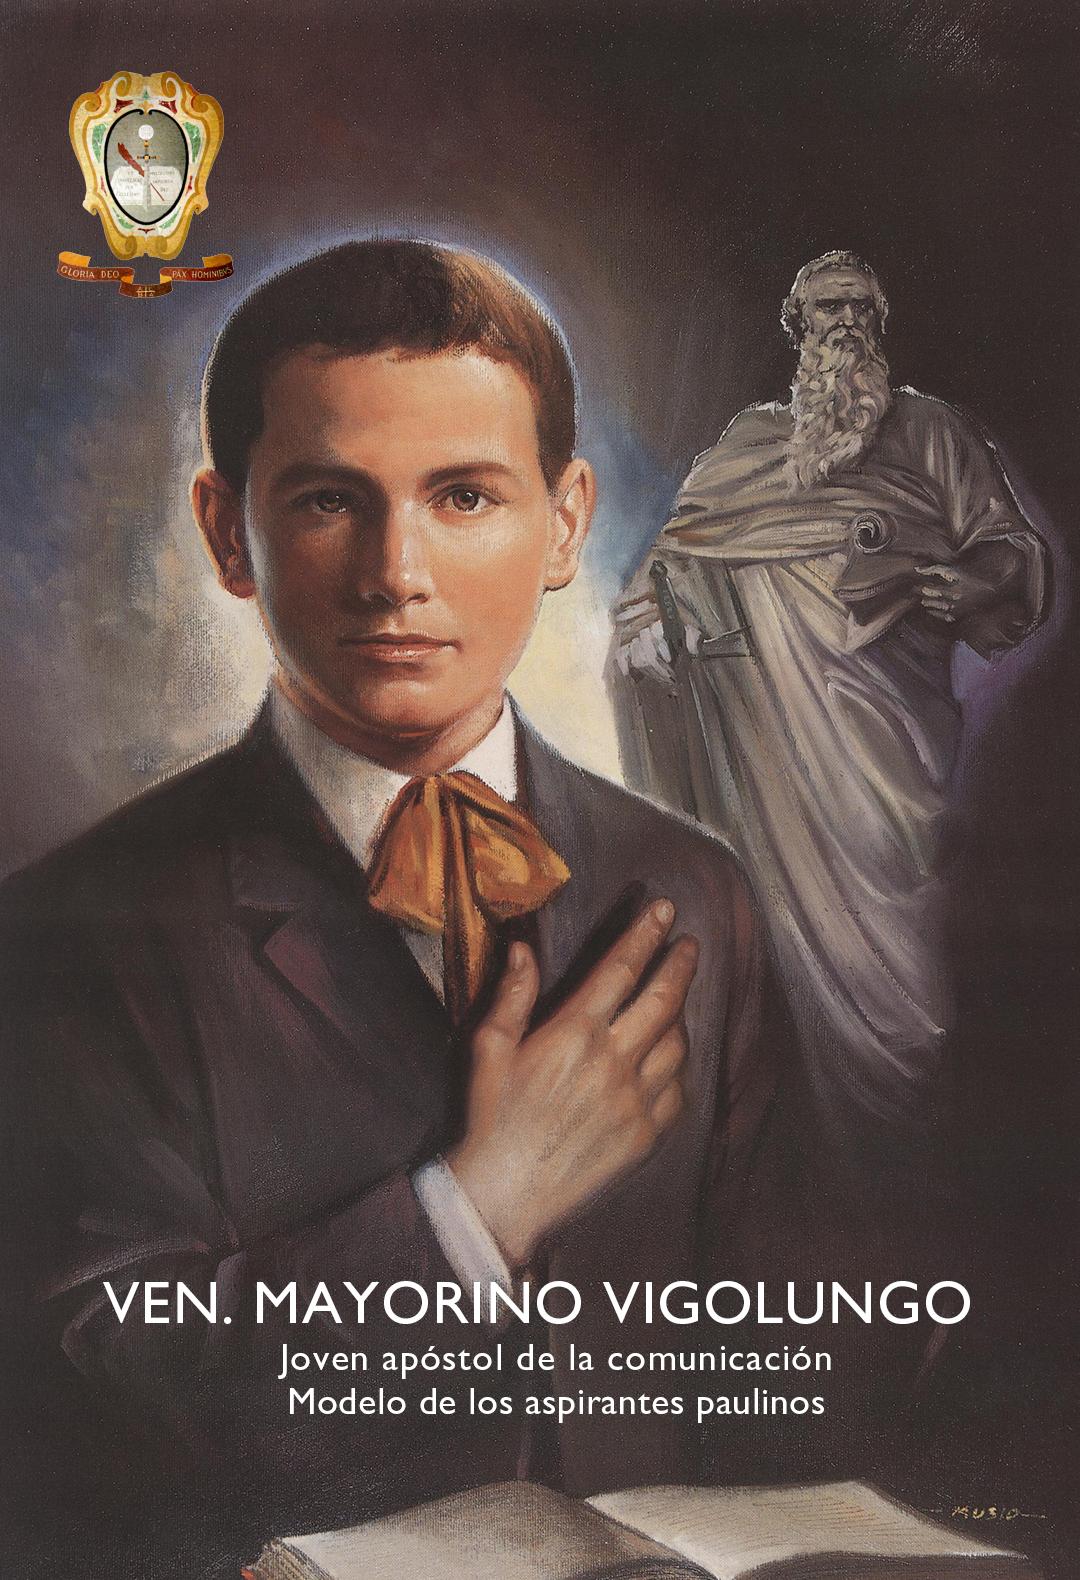 Venerable Mayorino Vigolungo